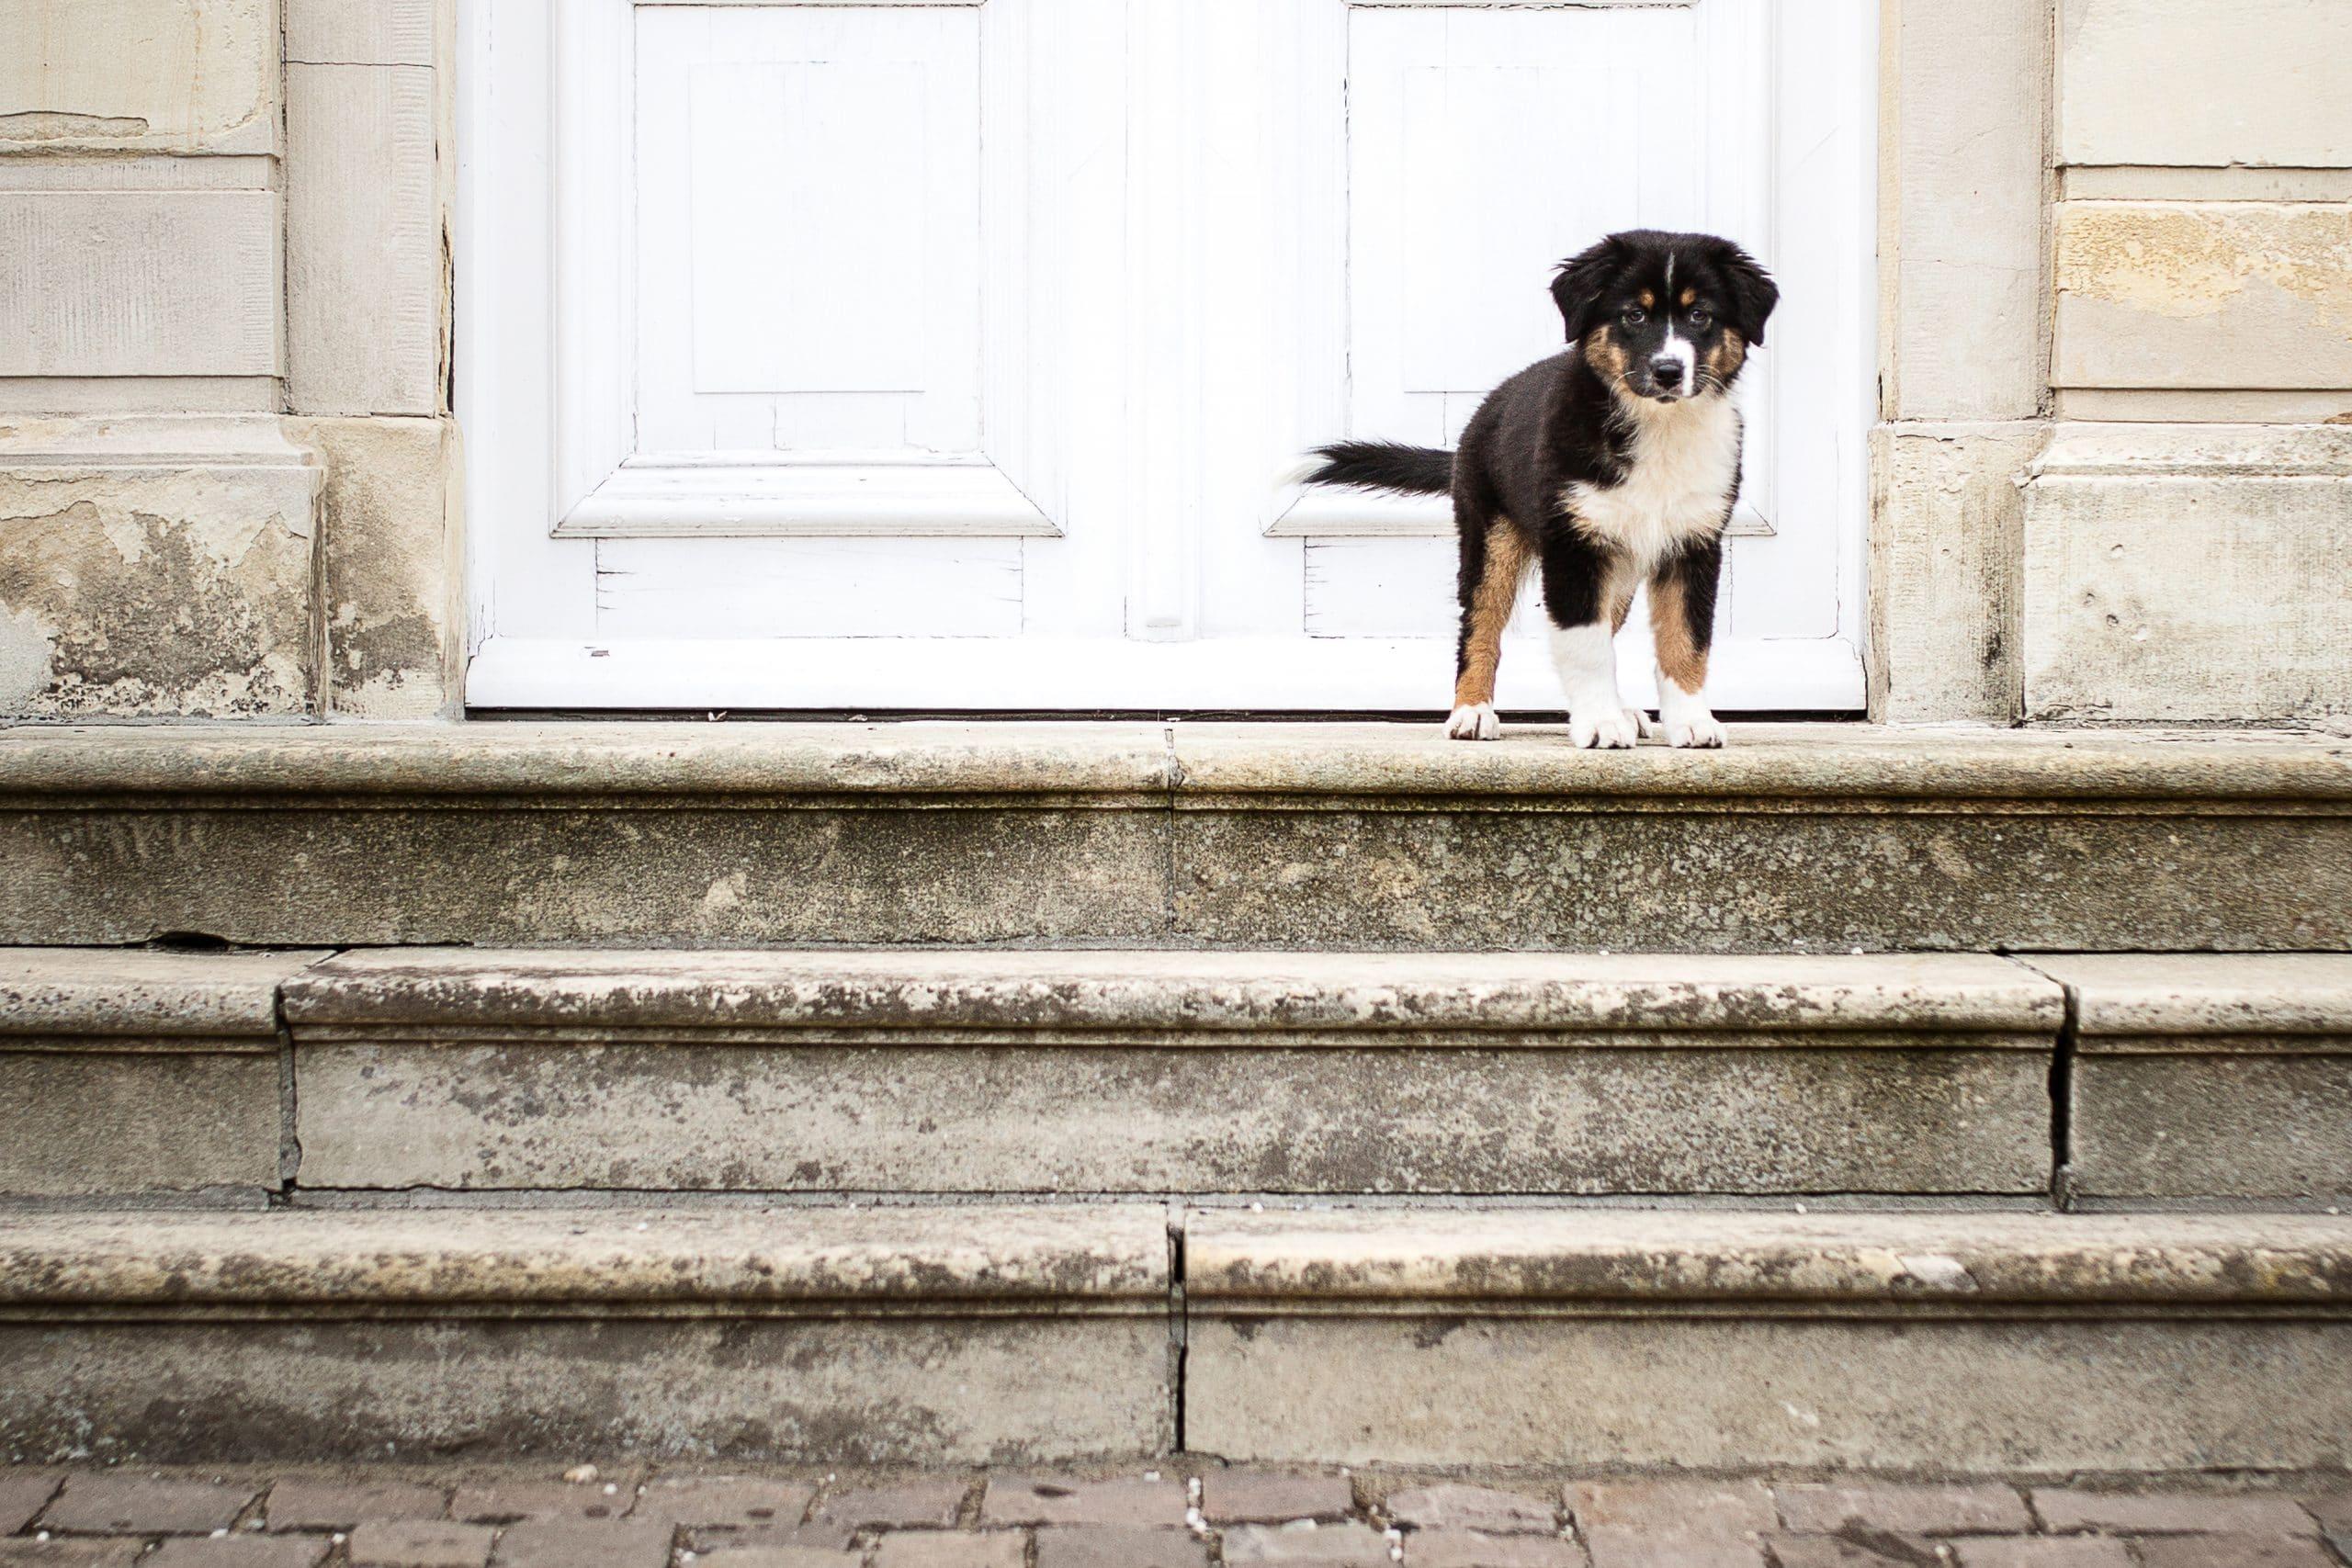 taya treppe - Hundetabus